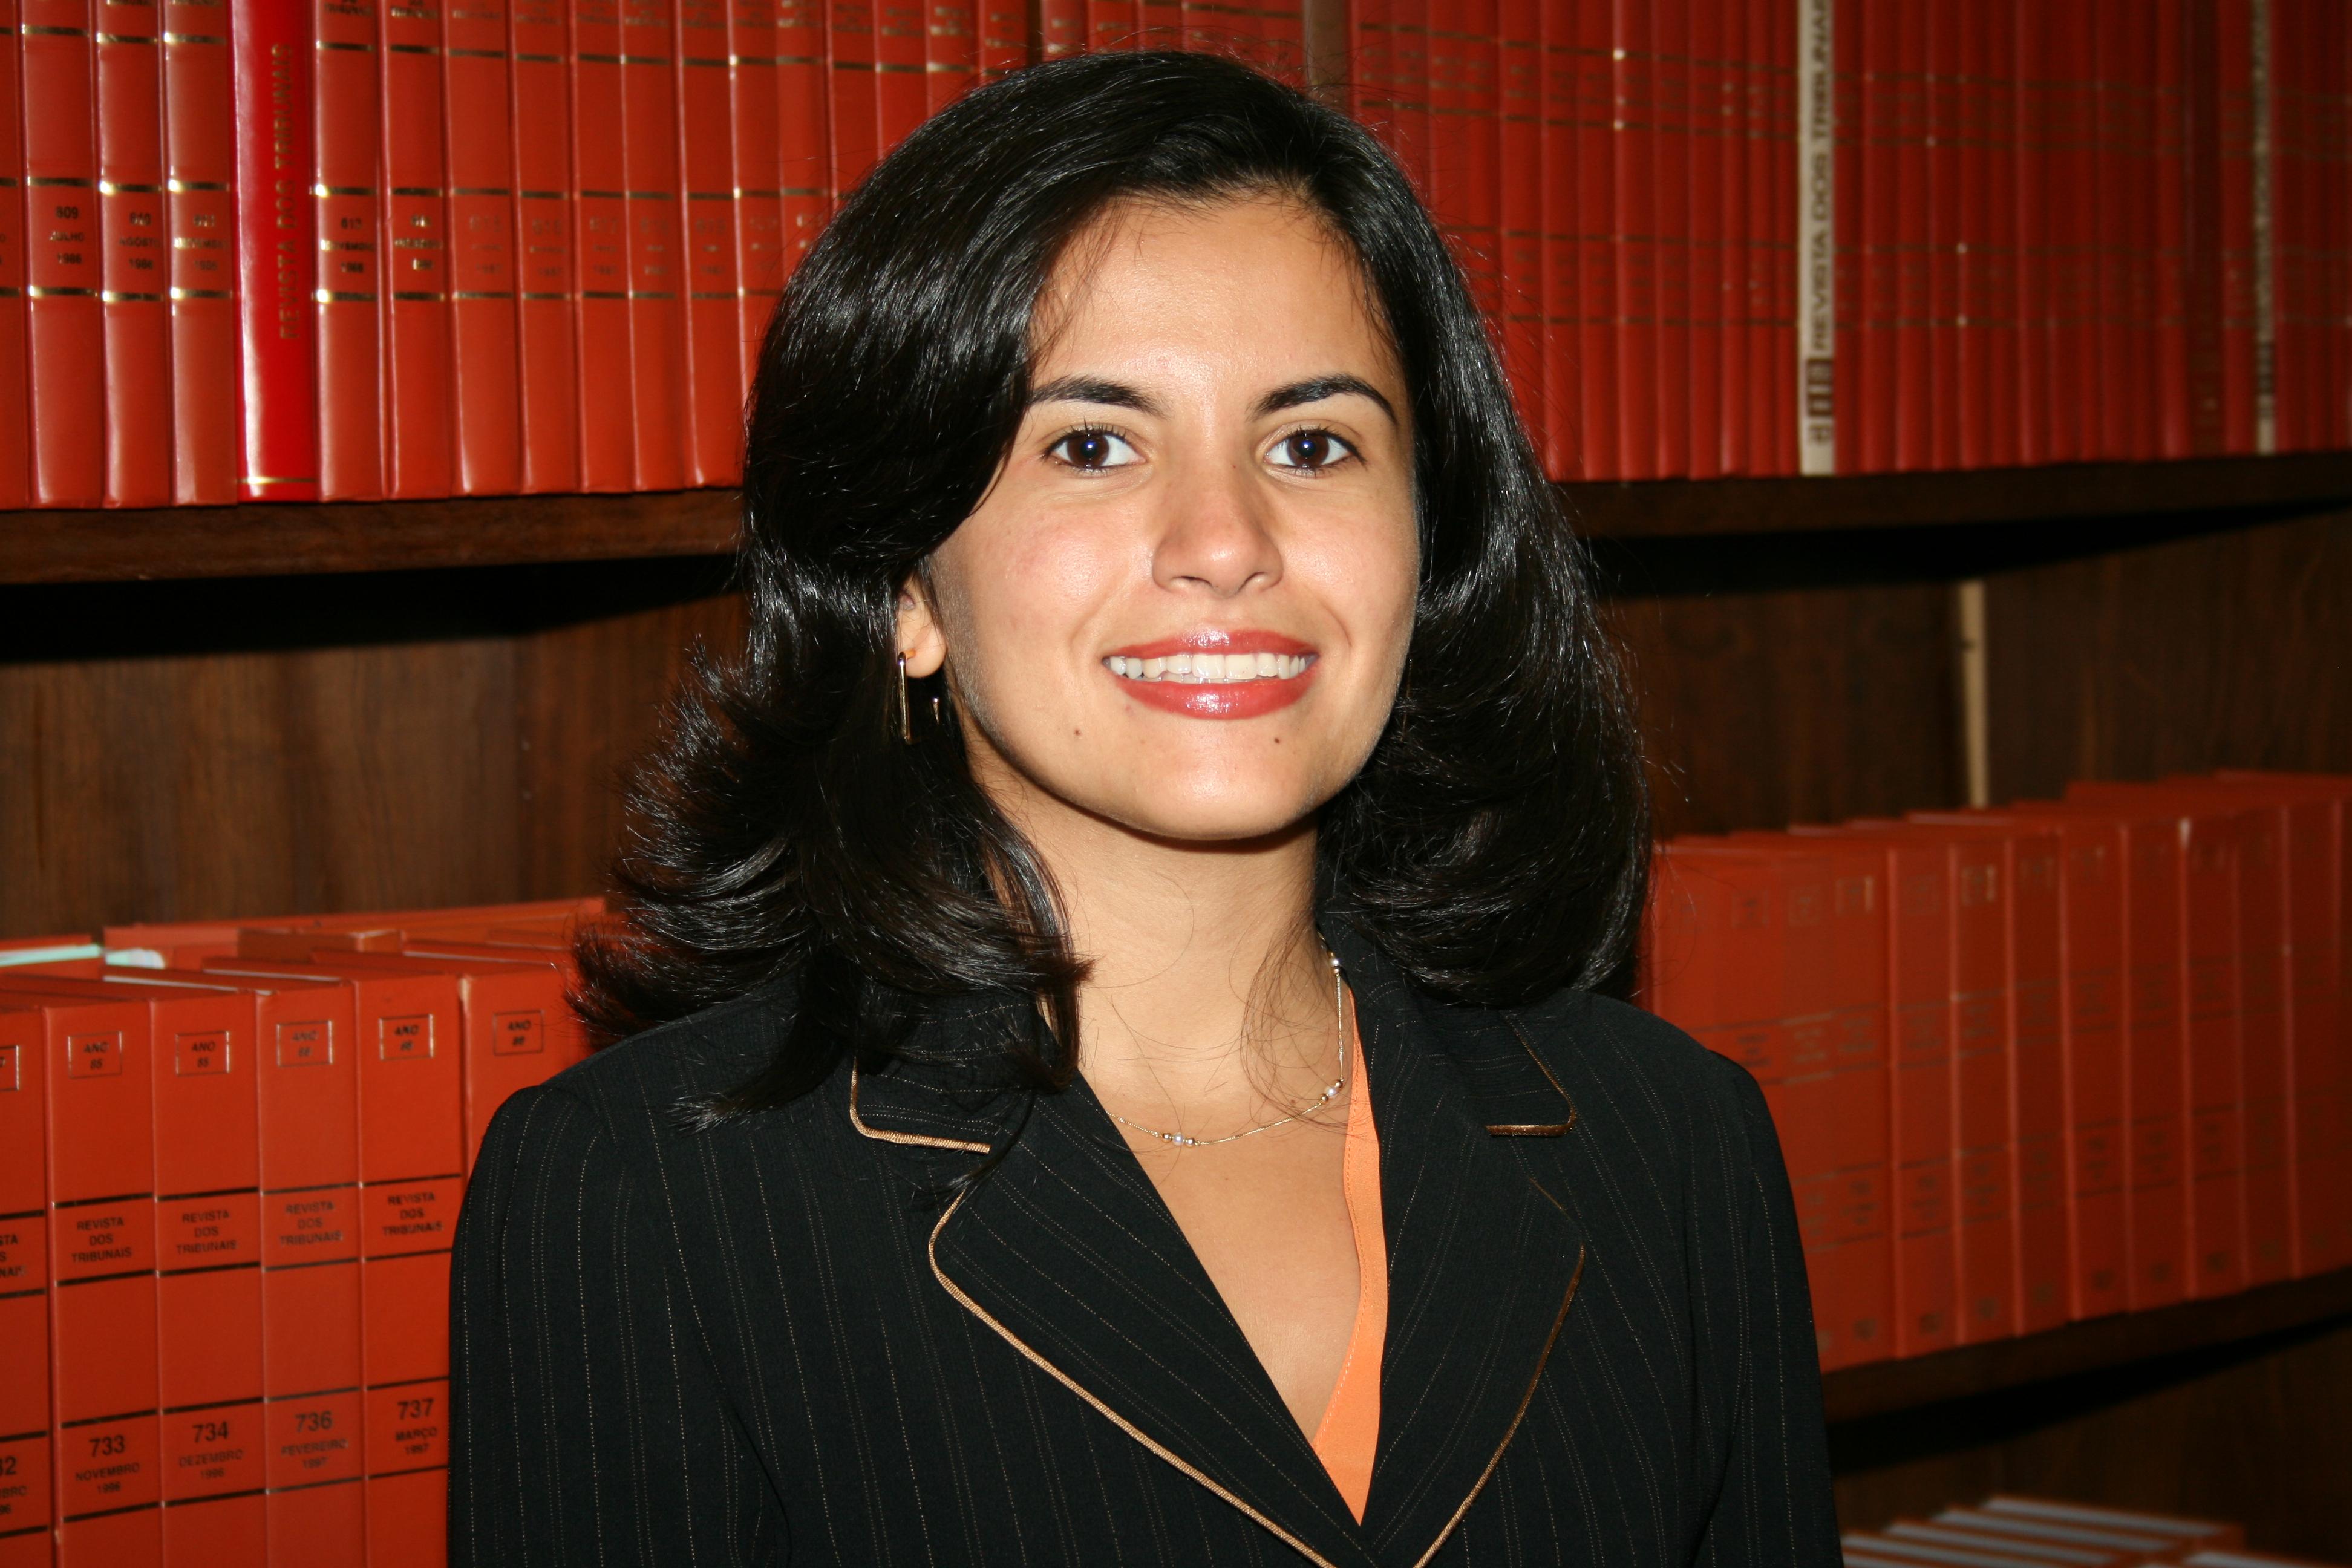 Roberta de Amorim Dutra